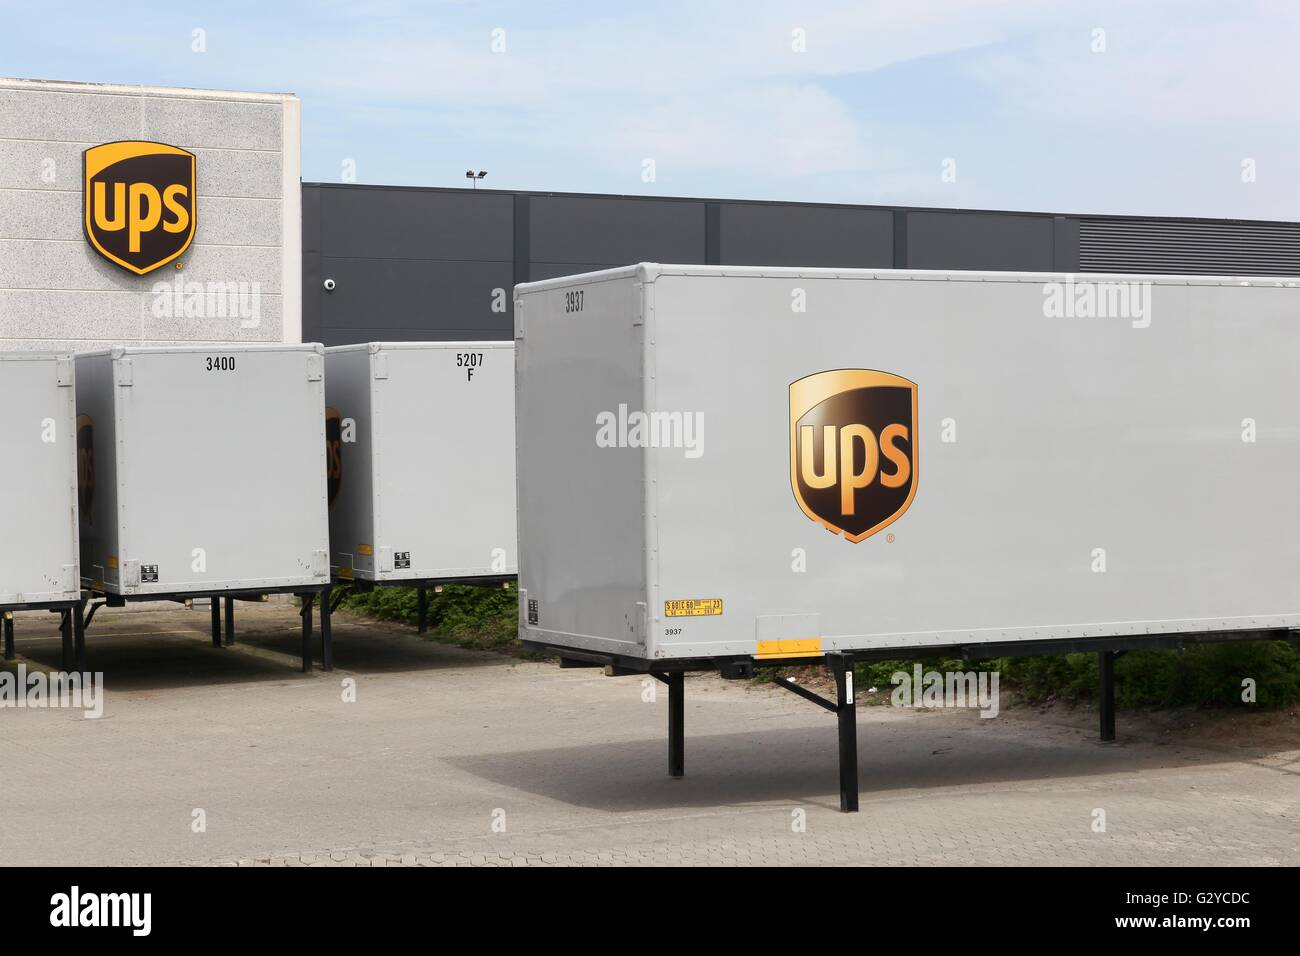 UPS logistics center - Stock Image